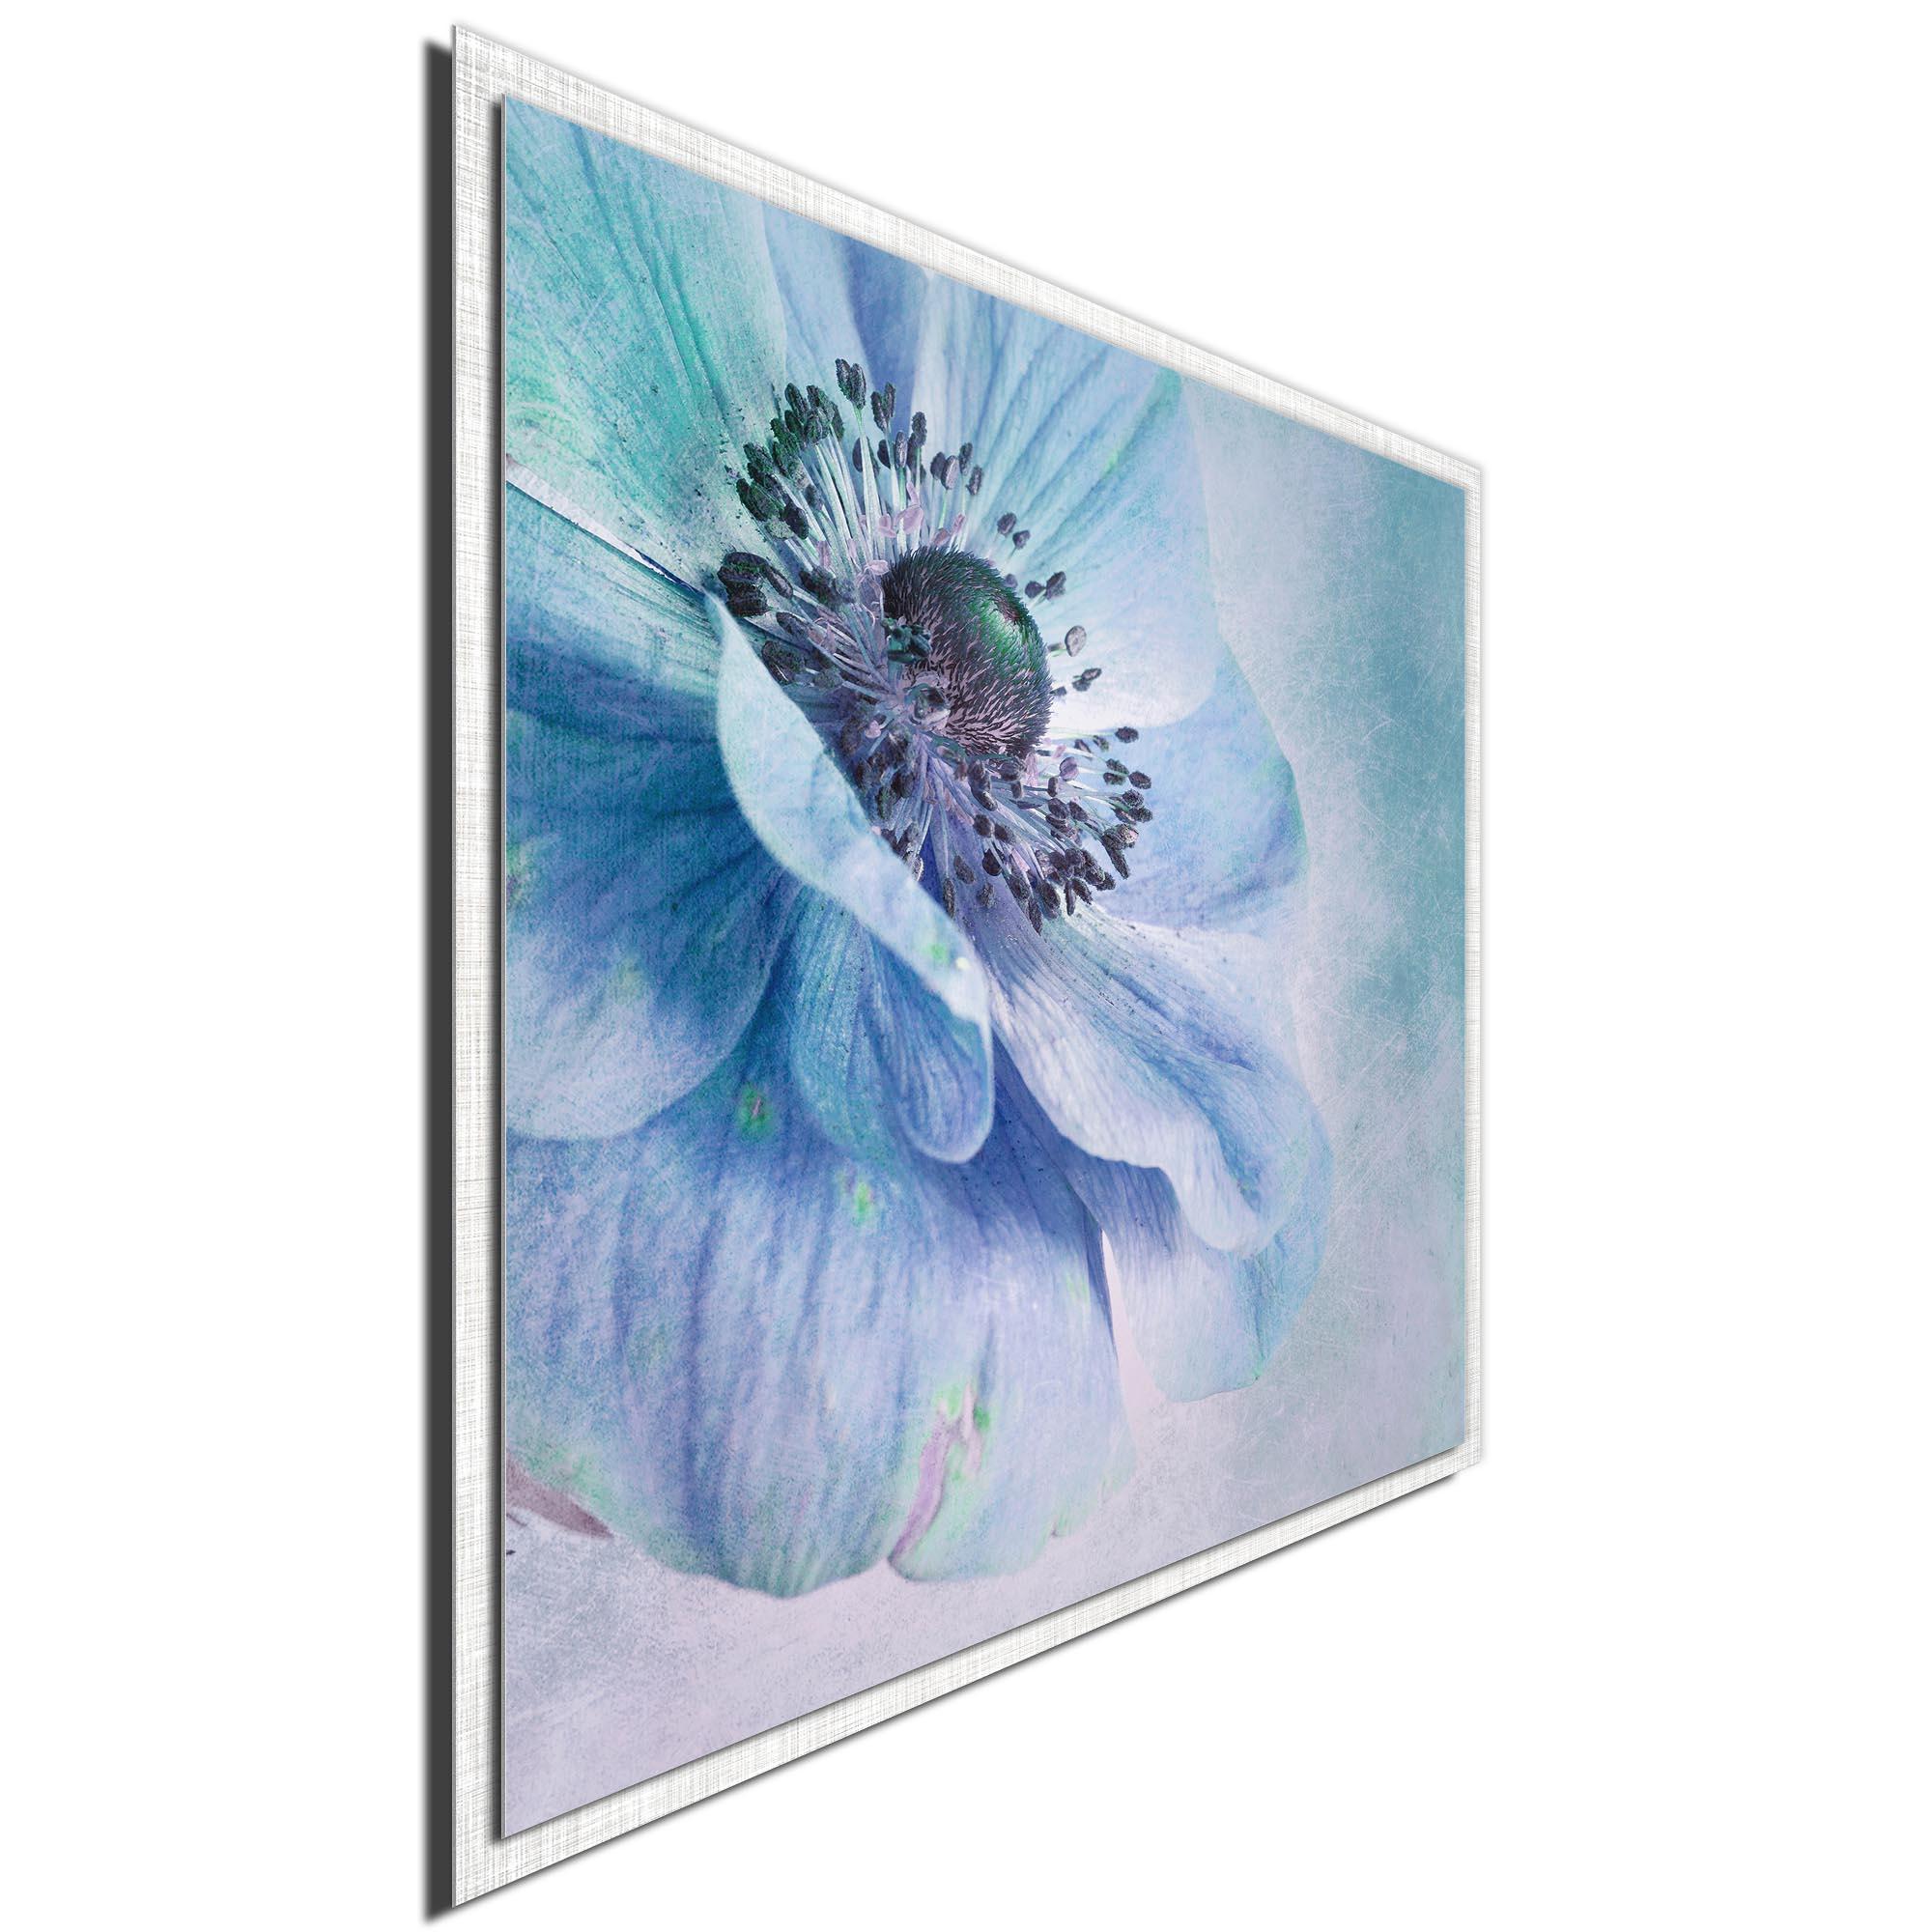 Shades of Blue by Priska Wettstein - Modern Farmhouse Floral on Metal - Image 2